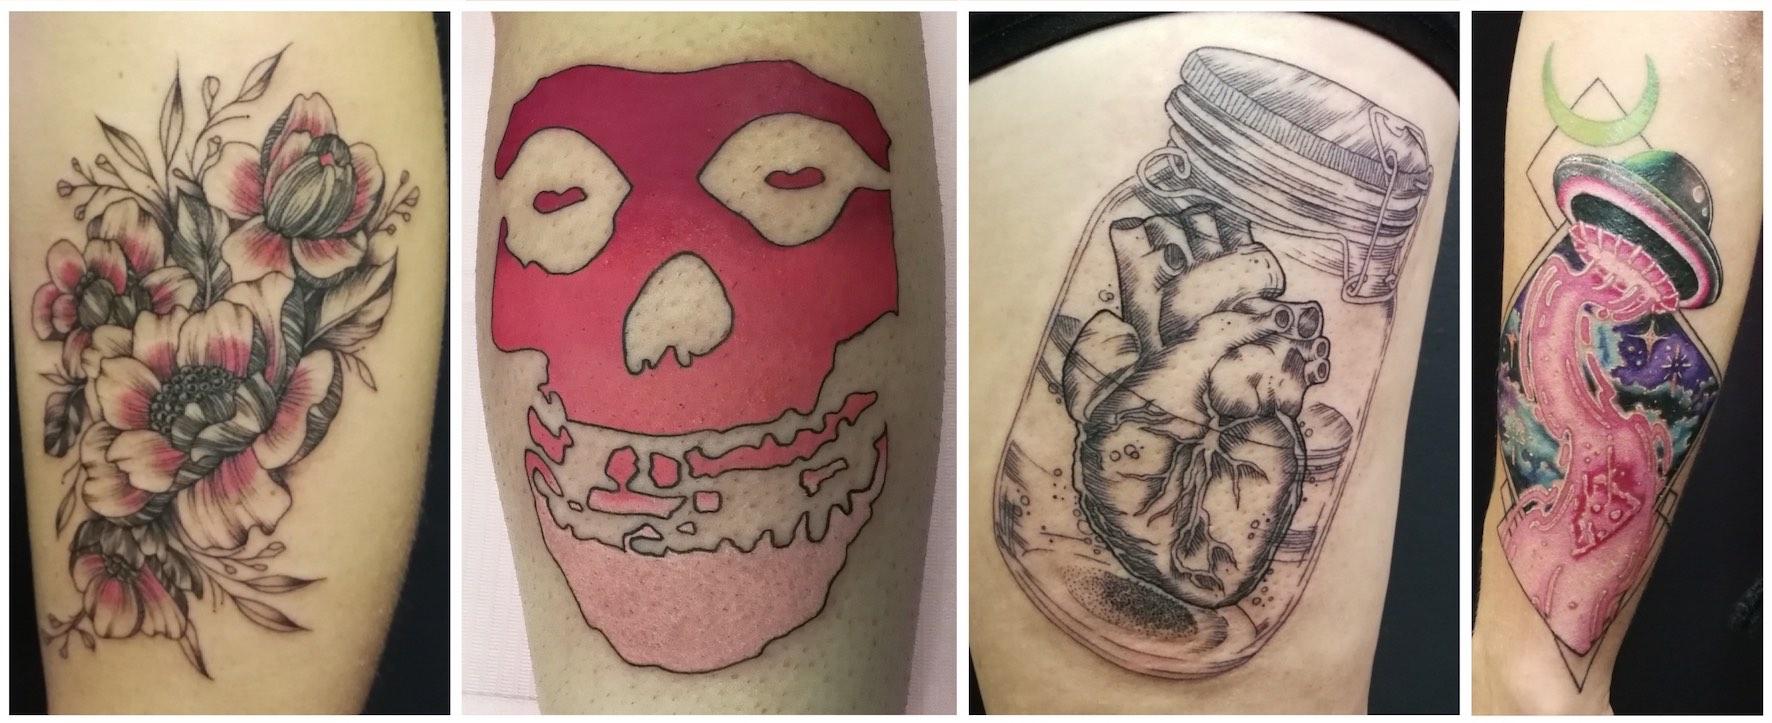 Tattoos created by Chelsea-Rae Marsh